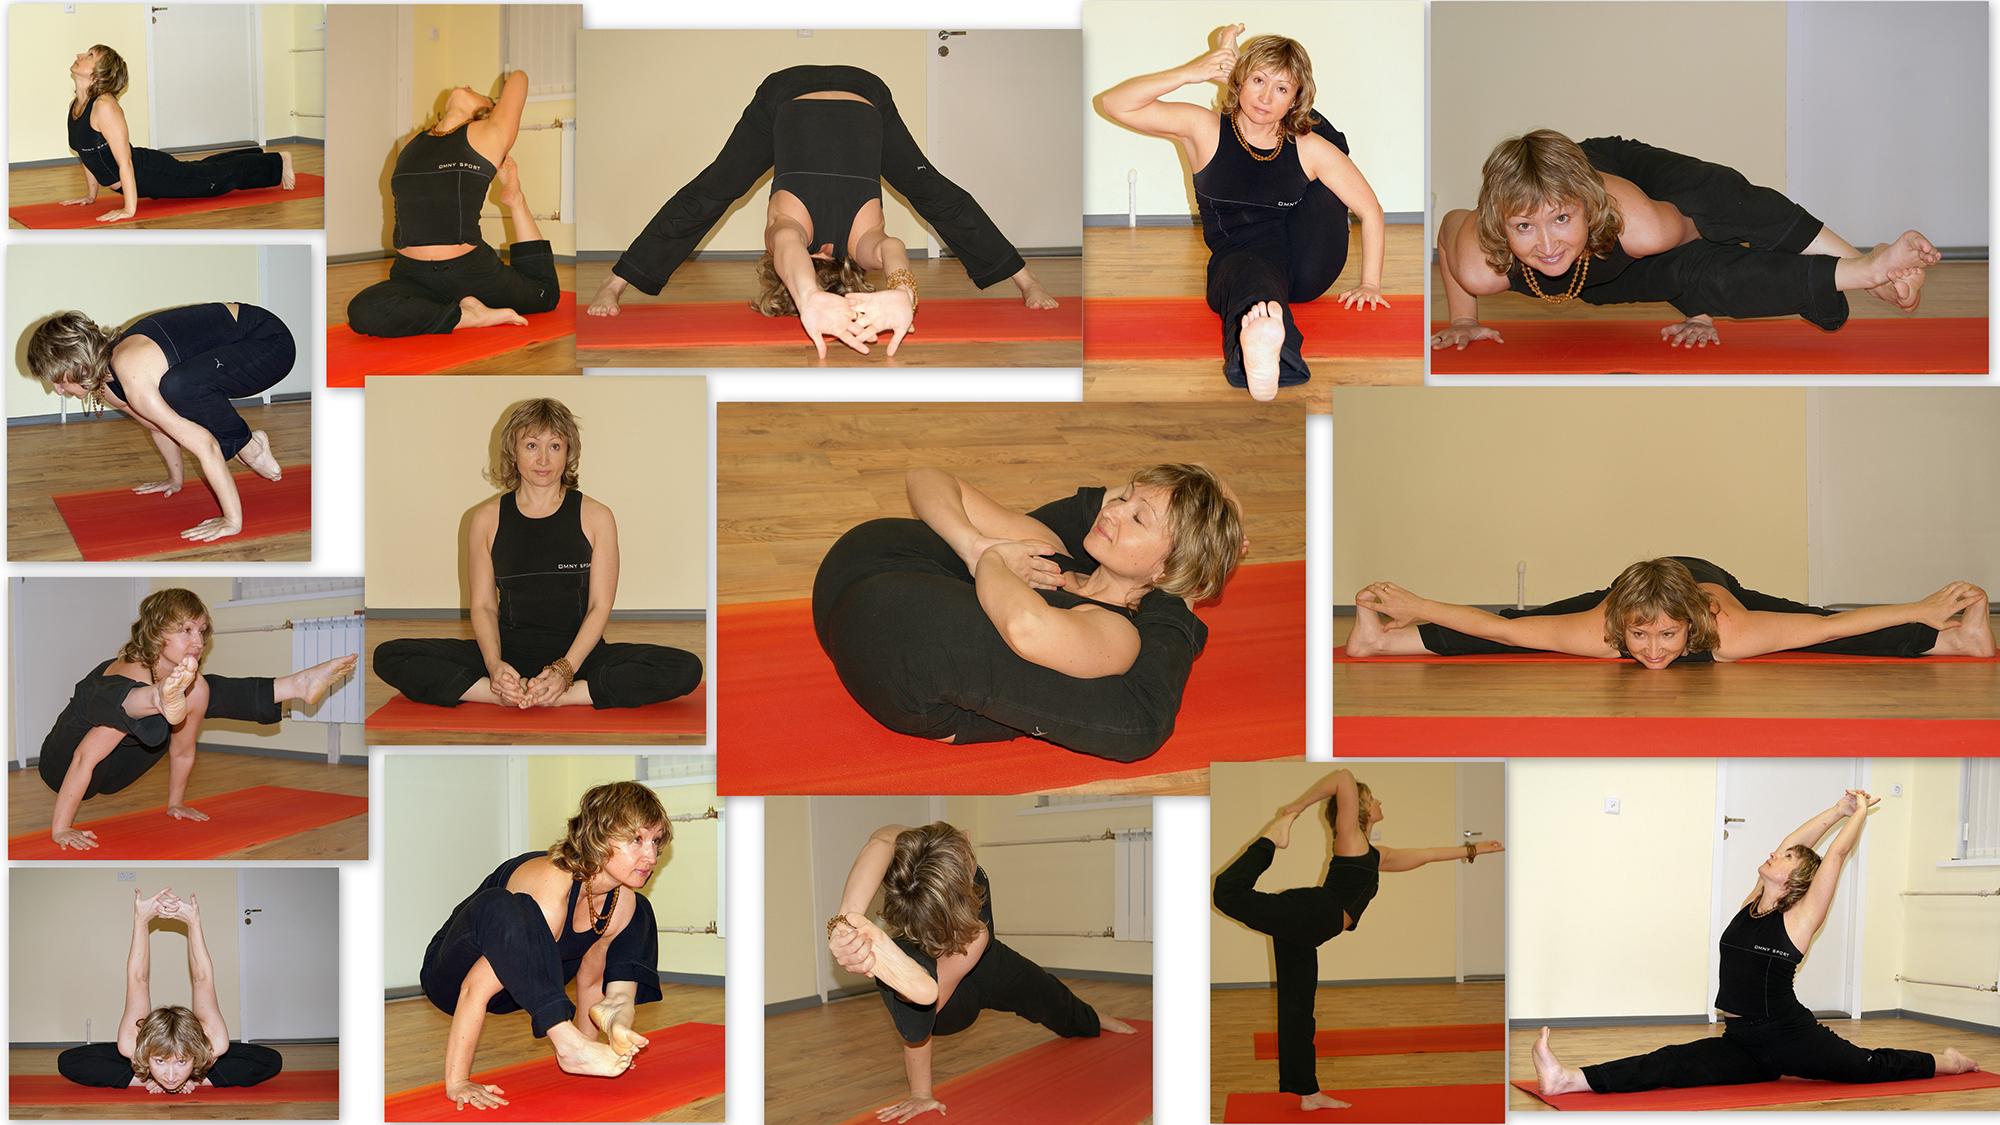 Гимнастика для начинающих в домашних условиях фото пошагово